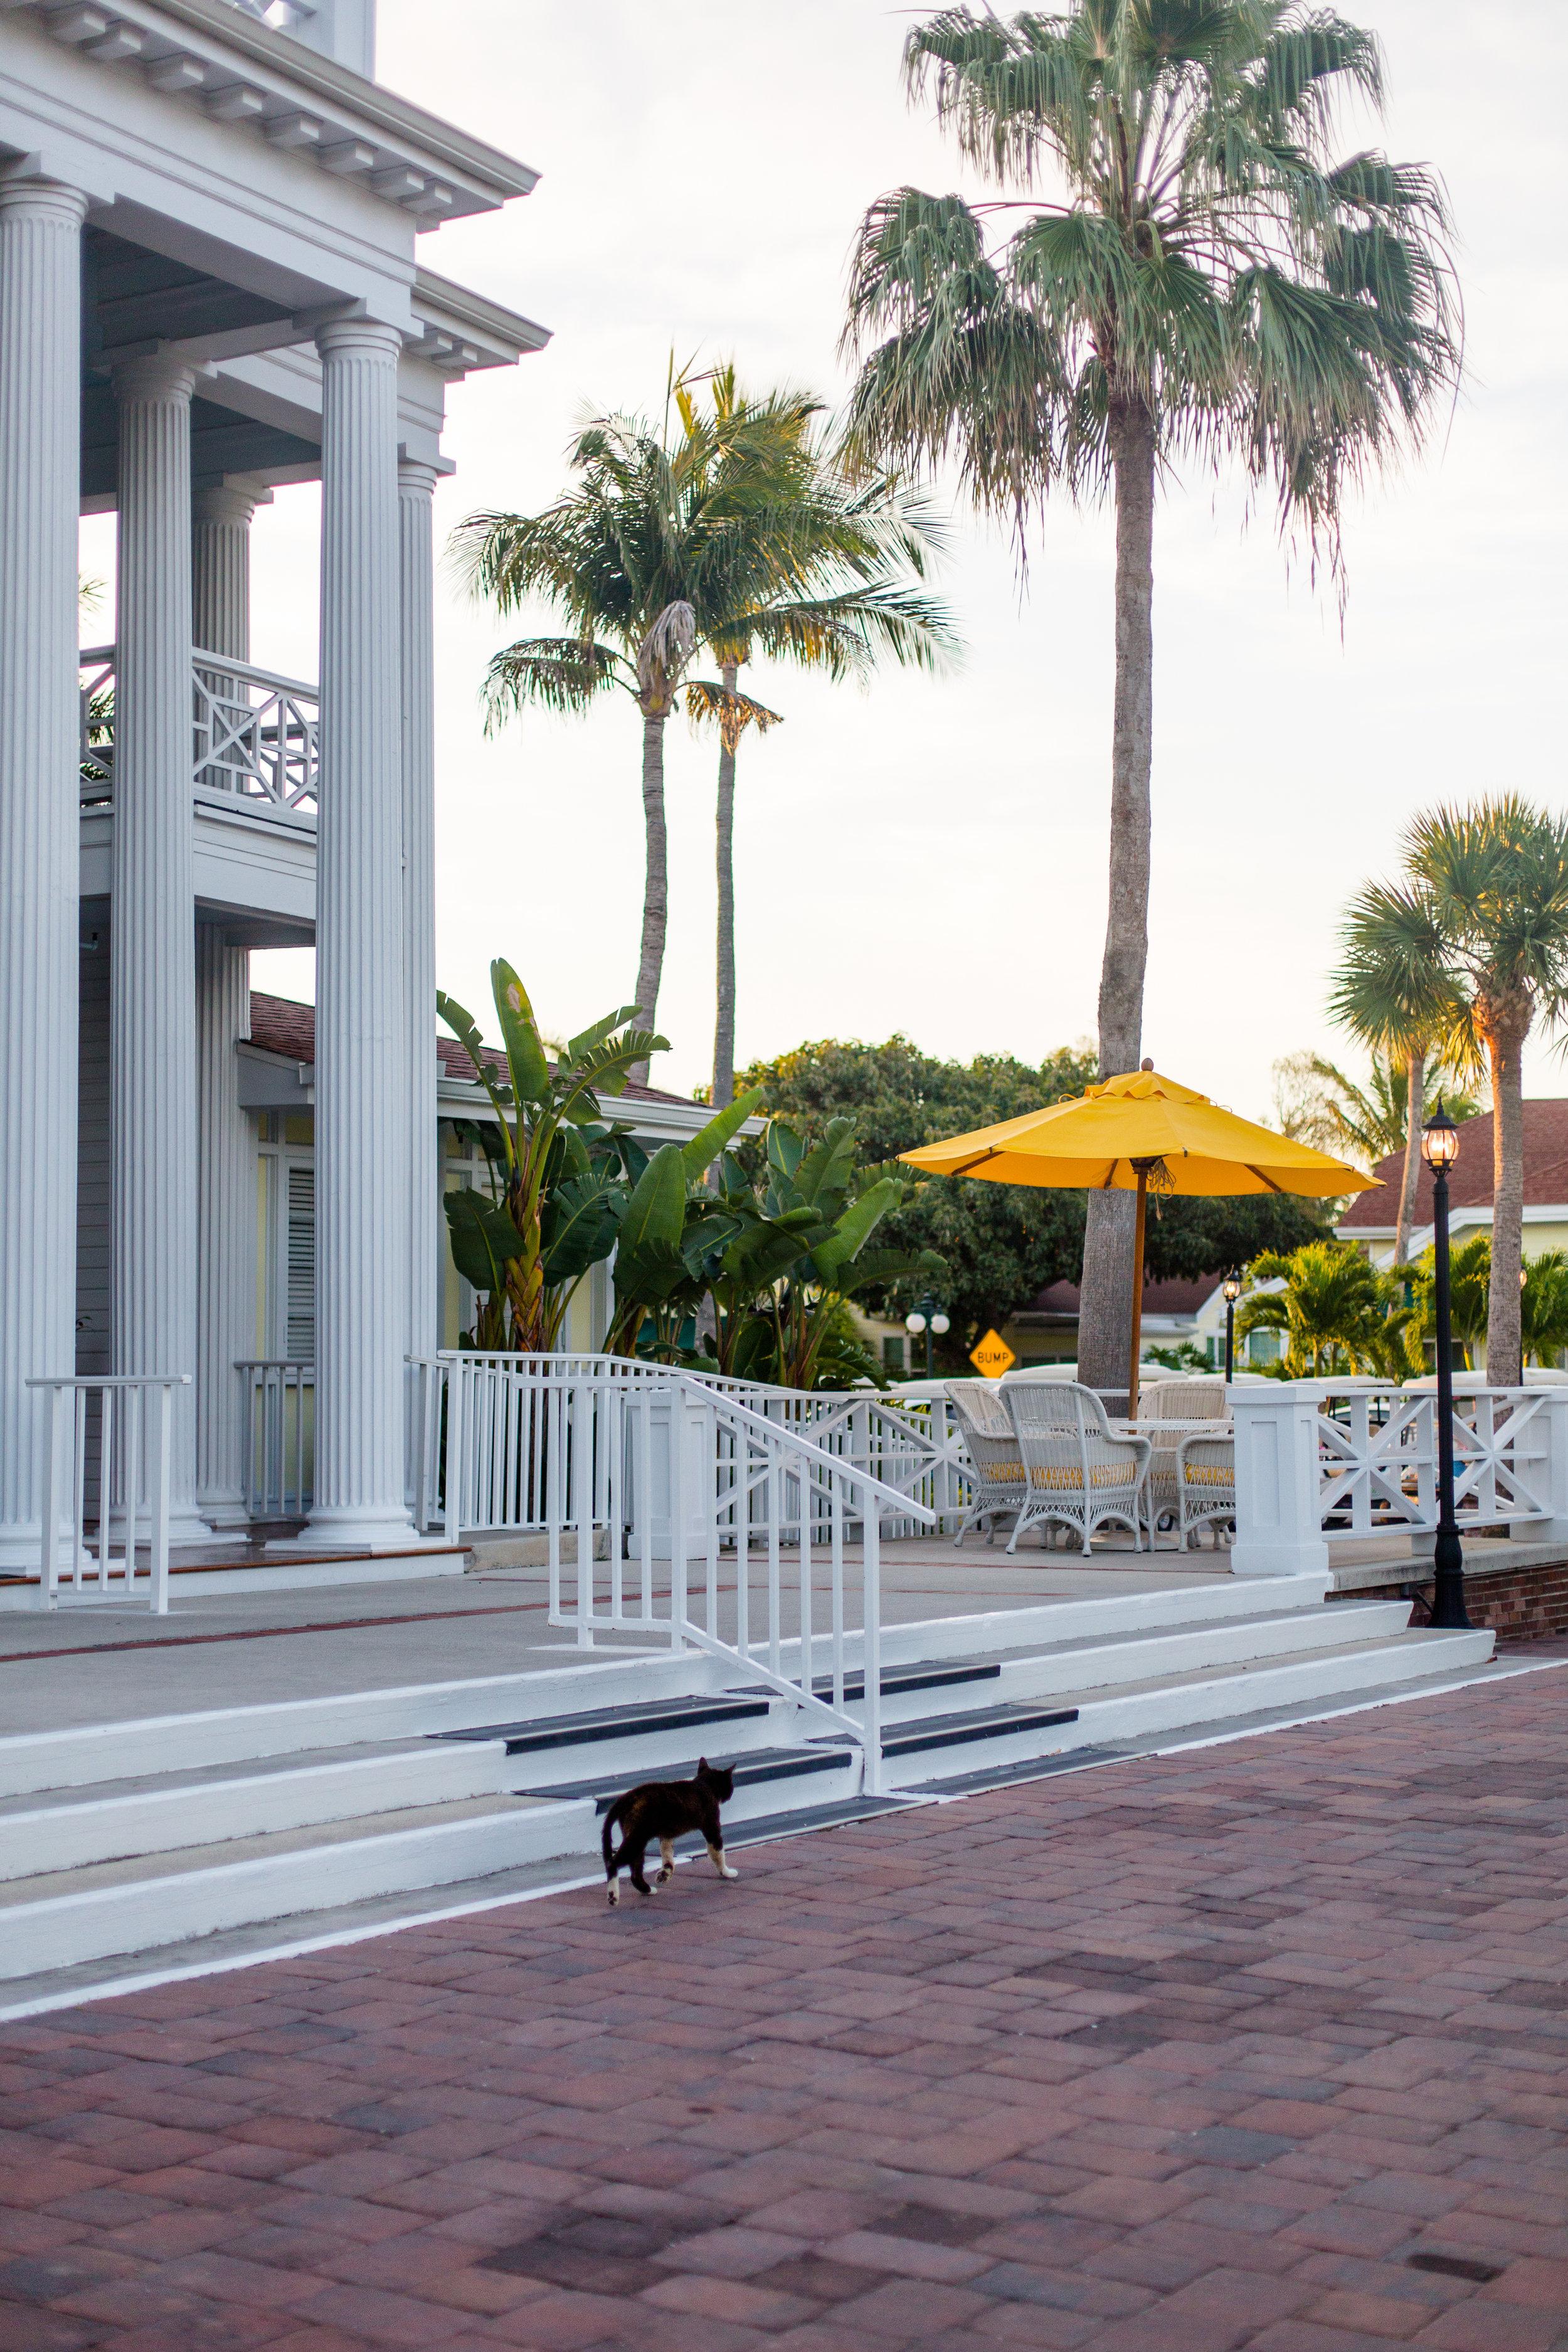 Boca Grande Florida Gasparilla Travel Guide from Abby Capalbo